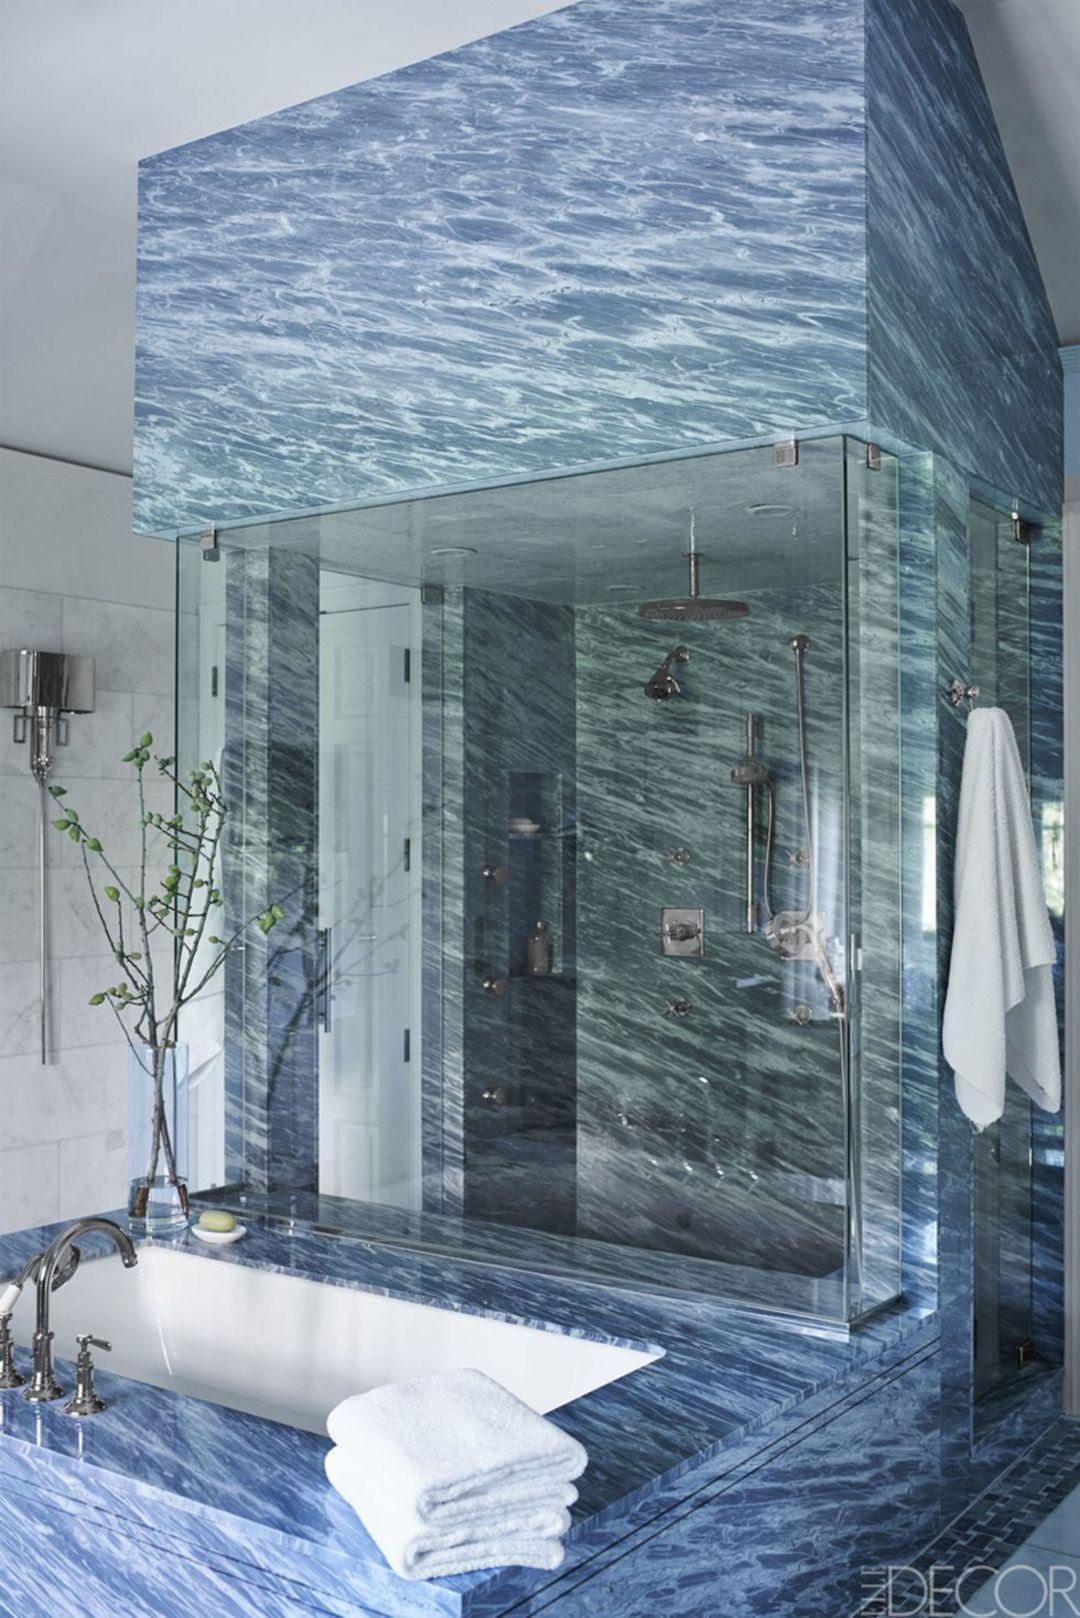 beautiful minimalist bathroom decorations ideas to inspire you